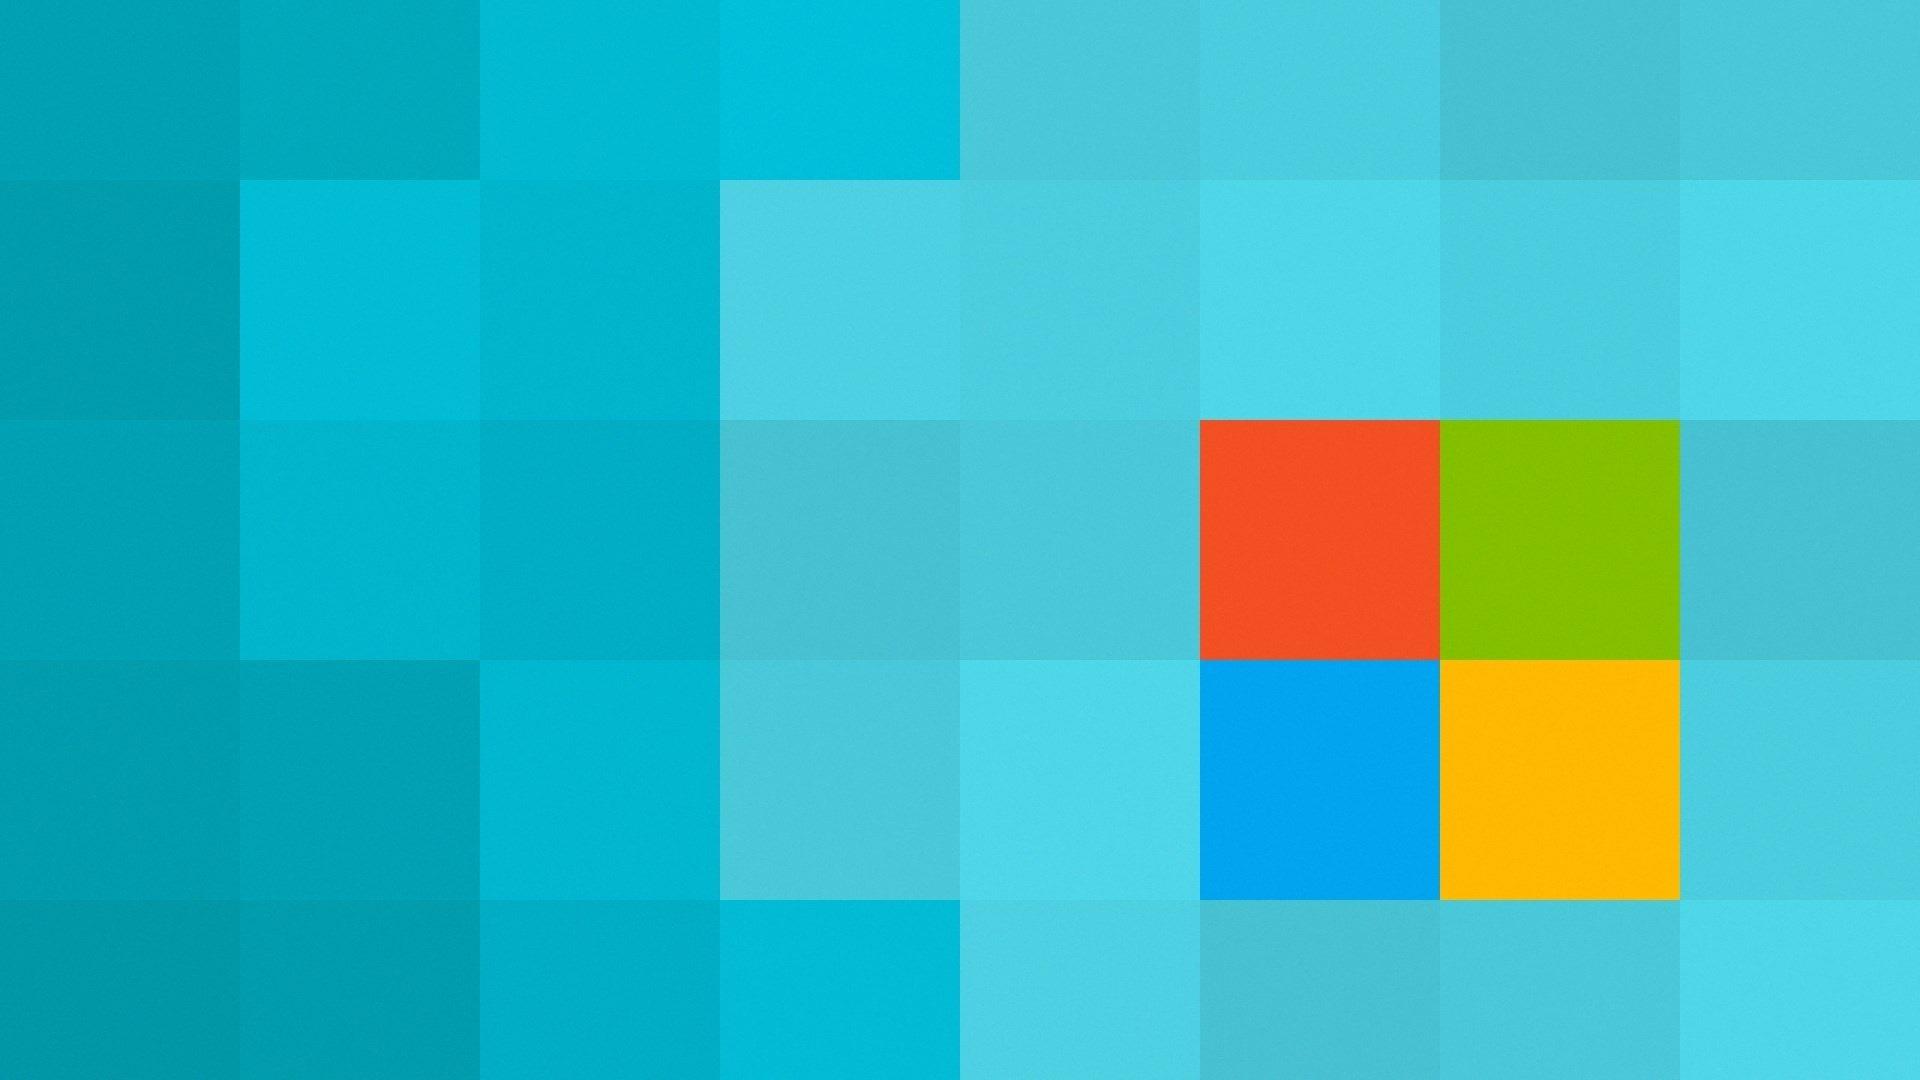 Pixel Microsoft Logo Pretty Cool Follow Me For More Byeeeeez Kyle The Windows Fan 2019 Samsung Wallpaper Wallpaper Windows 10 Cool Wallpaper